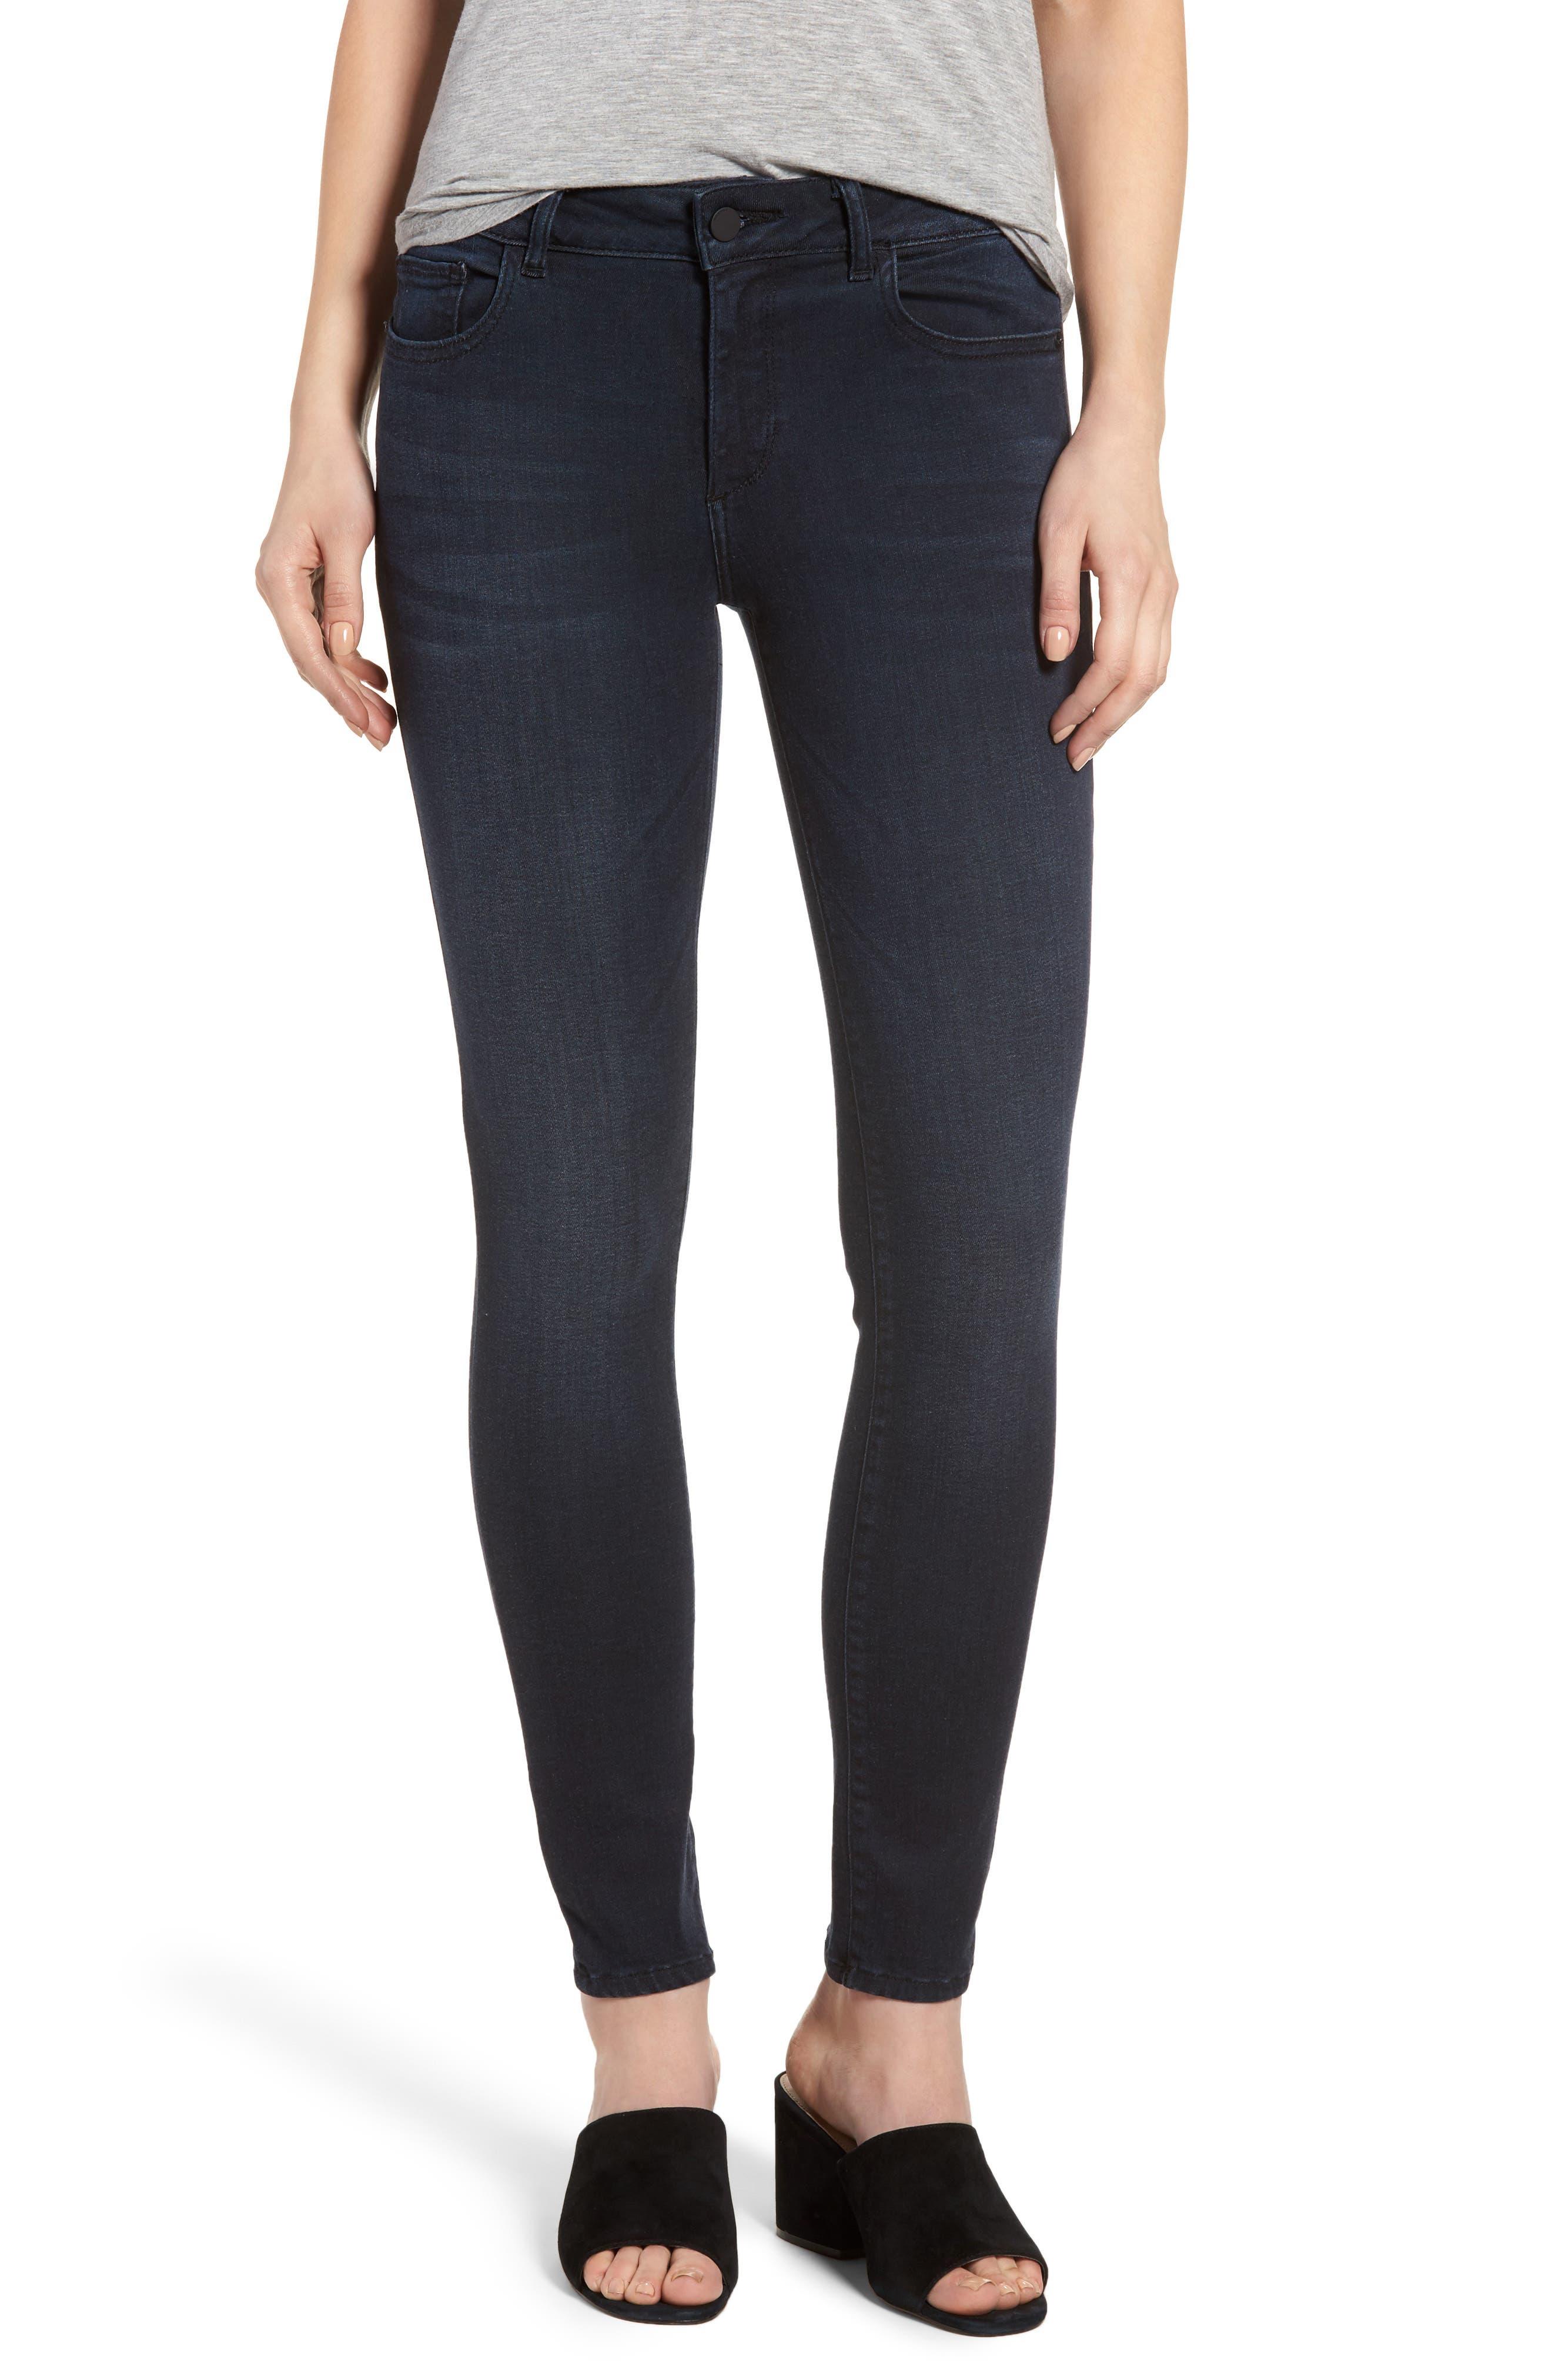 Main Image - DL1961 Emma Power Legging Skinny Jeans (Macon)